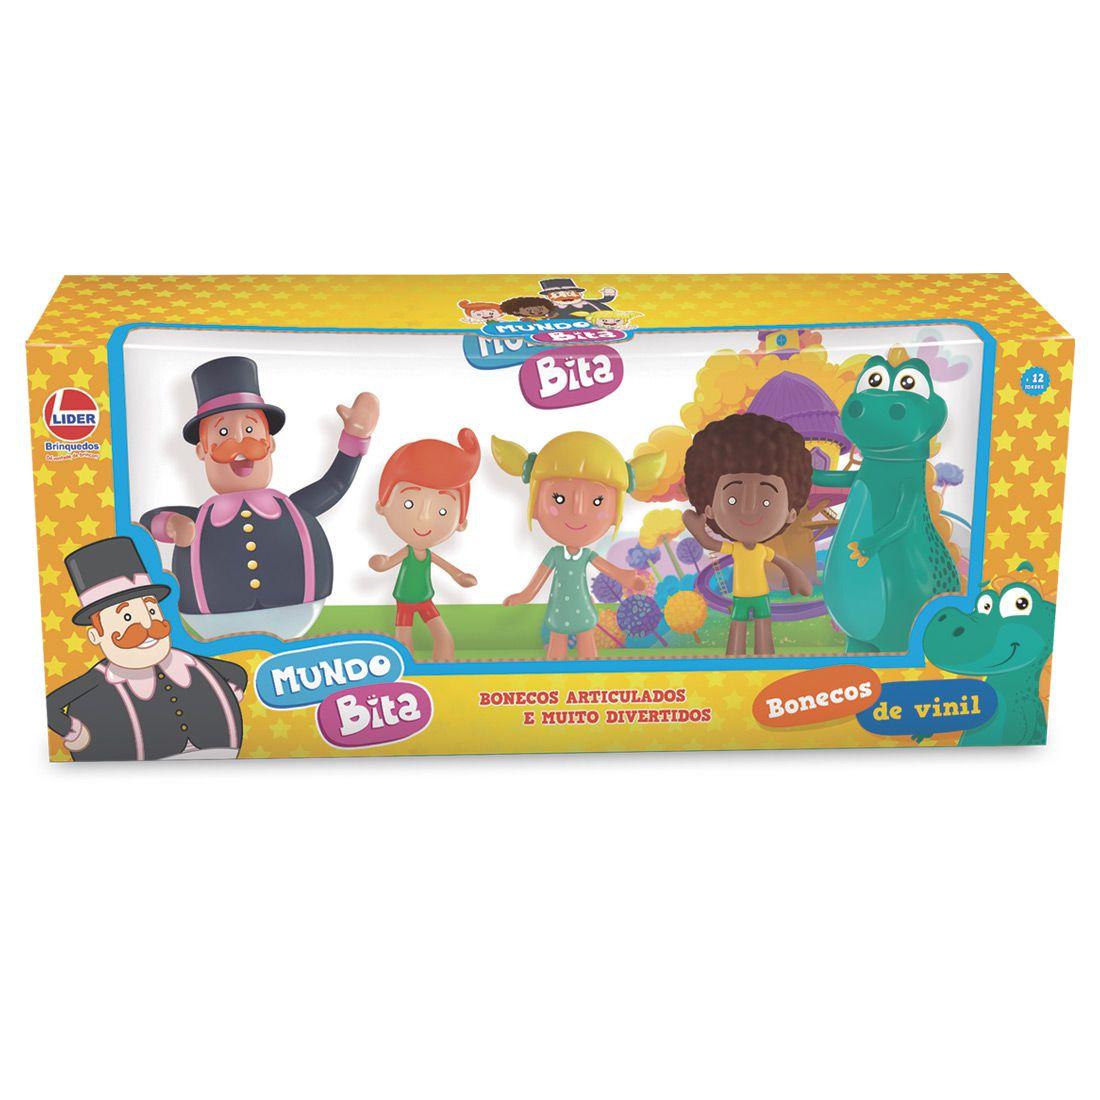 Família Bita Vinil  - Lojinha do Bita